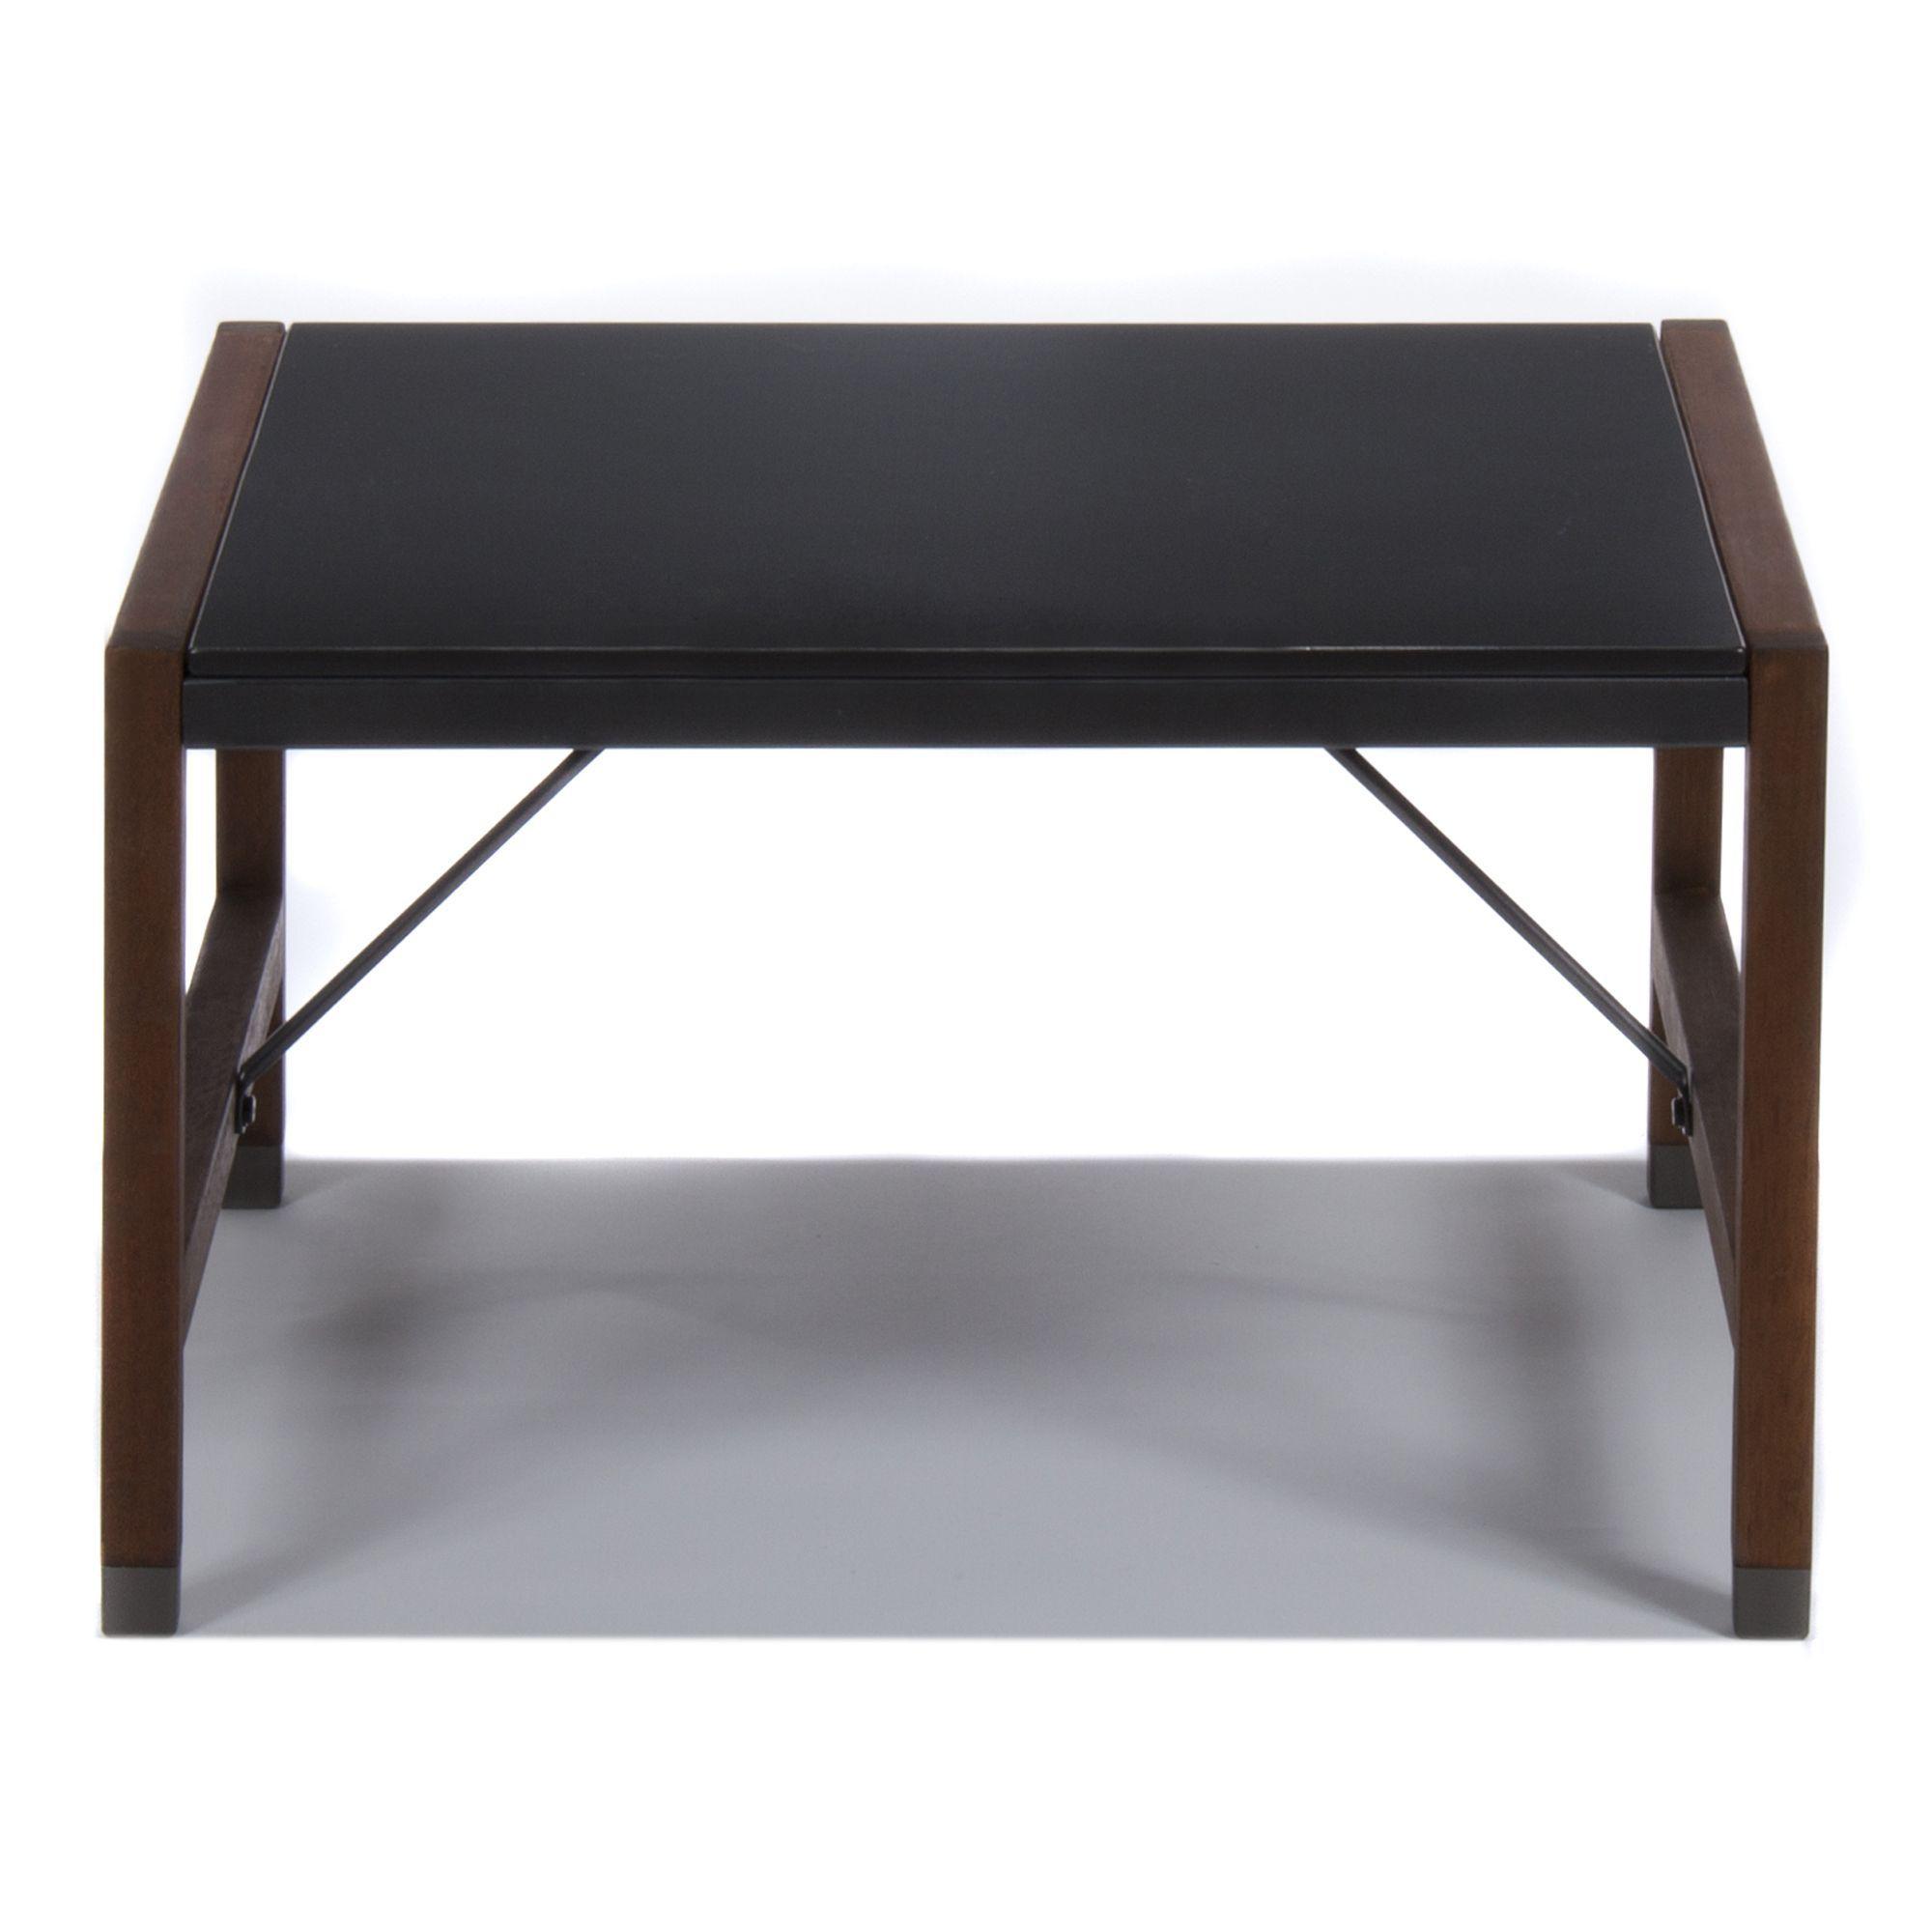 €99 Alinea 70X70Xh42 Fibrociment Table Basse De Jardin Rétro ... à Table Basse Alinea